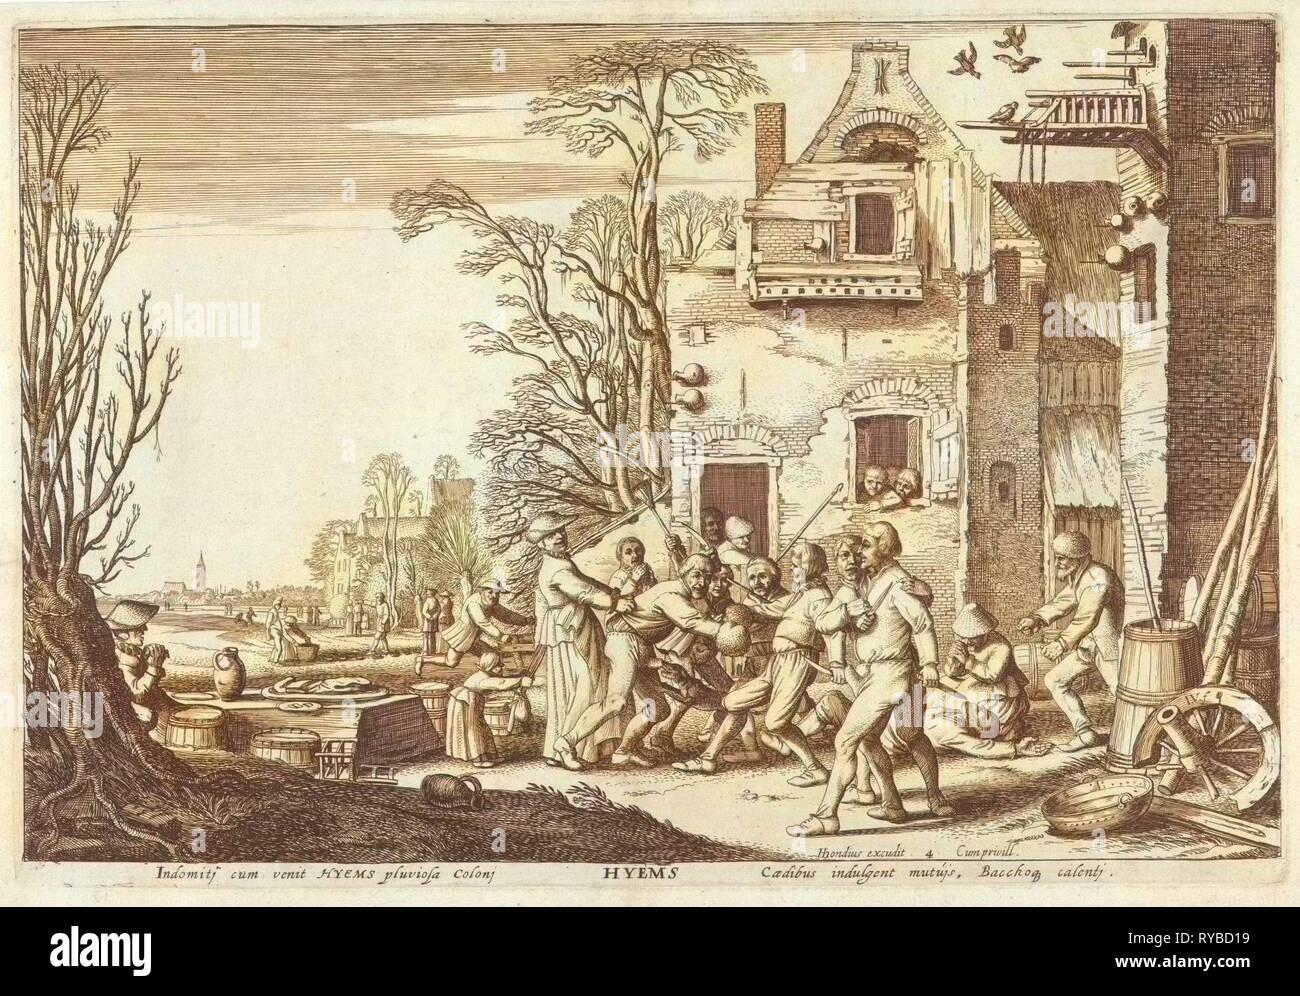 Inverno (Hyems), Jan van de Velde (II), Hendrick Hondius (MI), sconosciuto, 1617 Immagini Stock